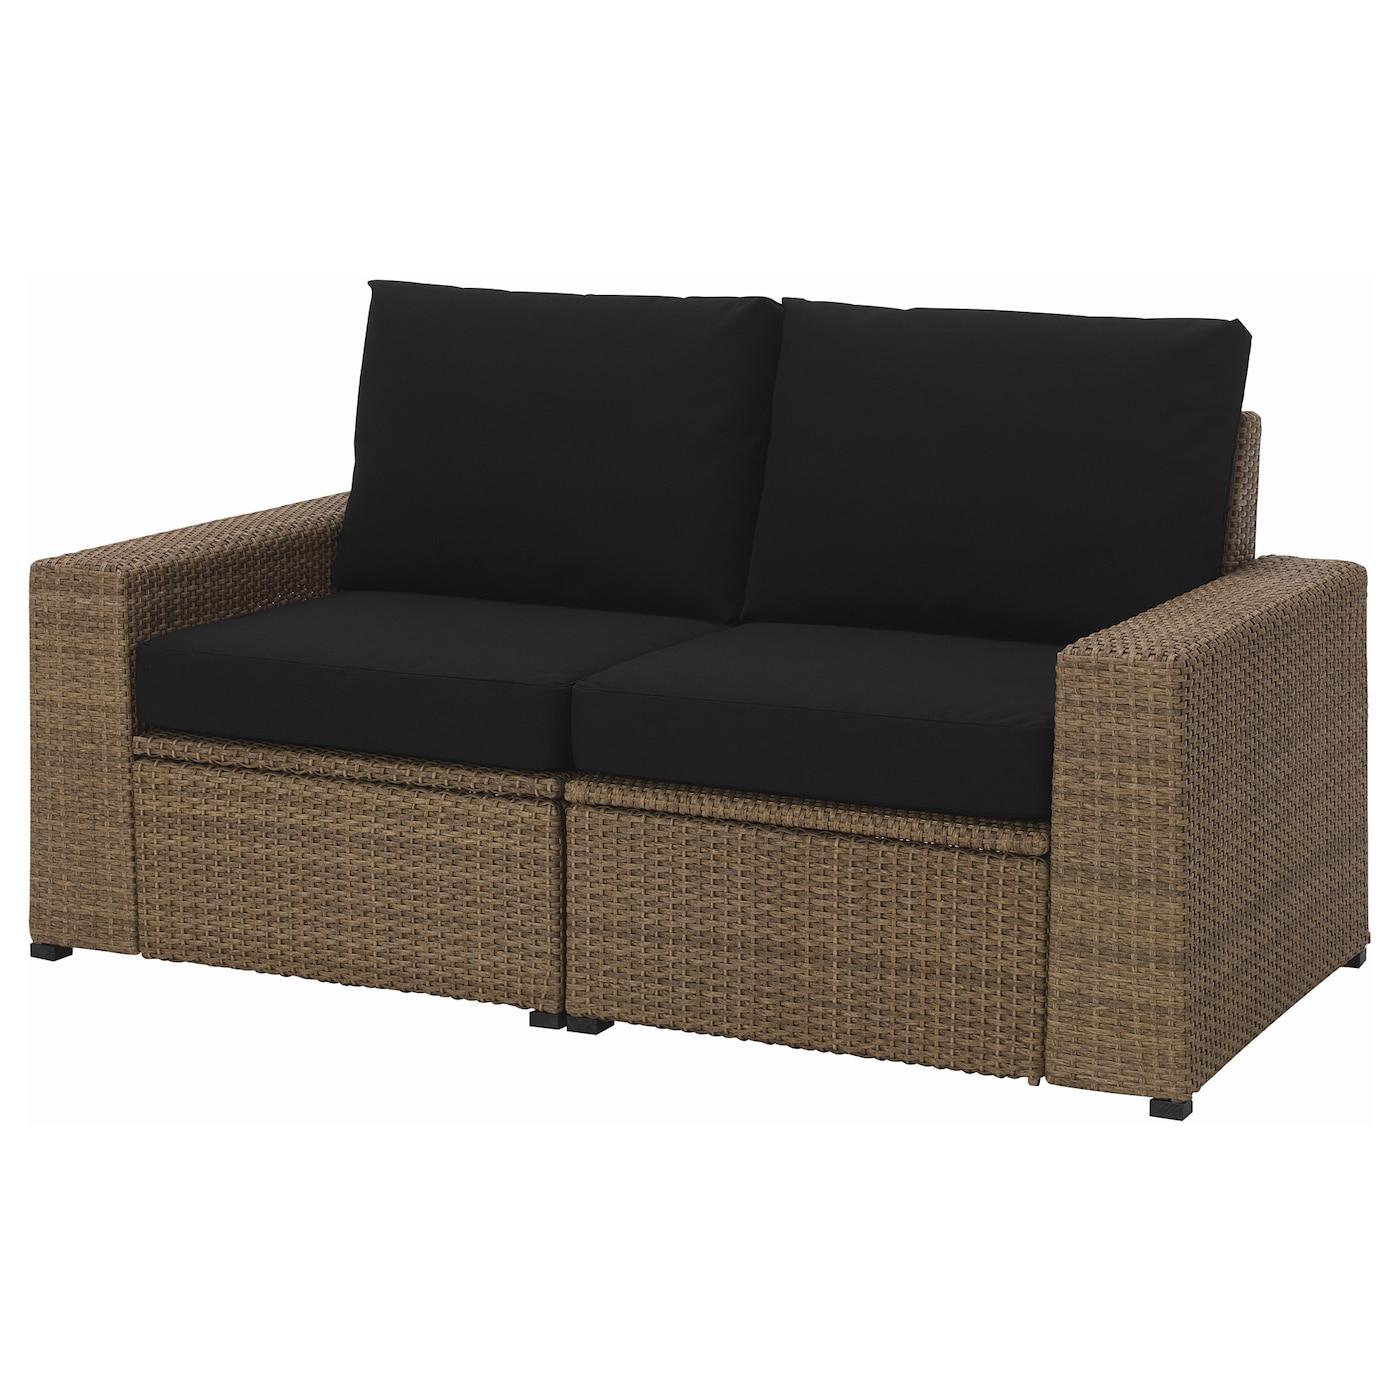 rattan 2 seater sofa rattan waterhyacinth furniture khao lak home design thesofa. Black Bedroom Furniture Sets. Home Design Ideas